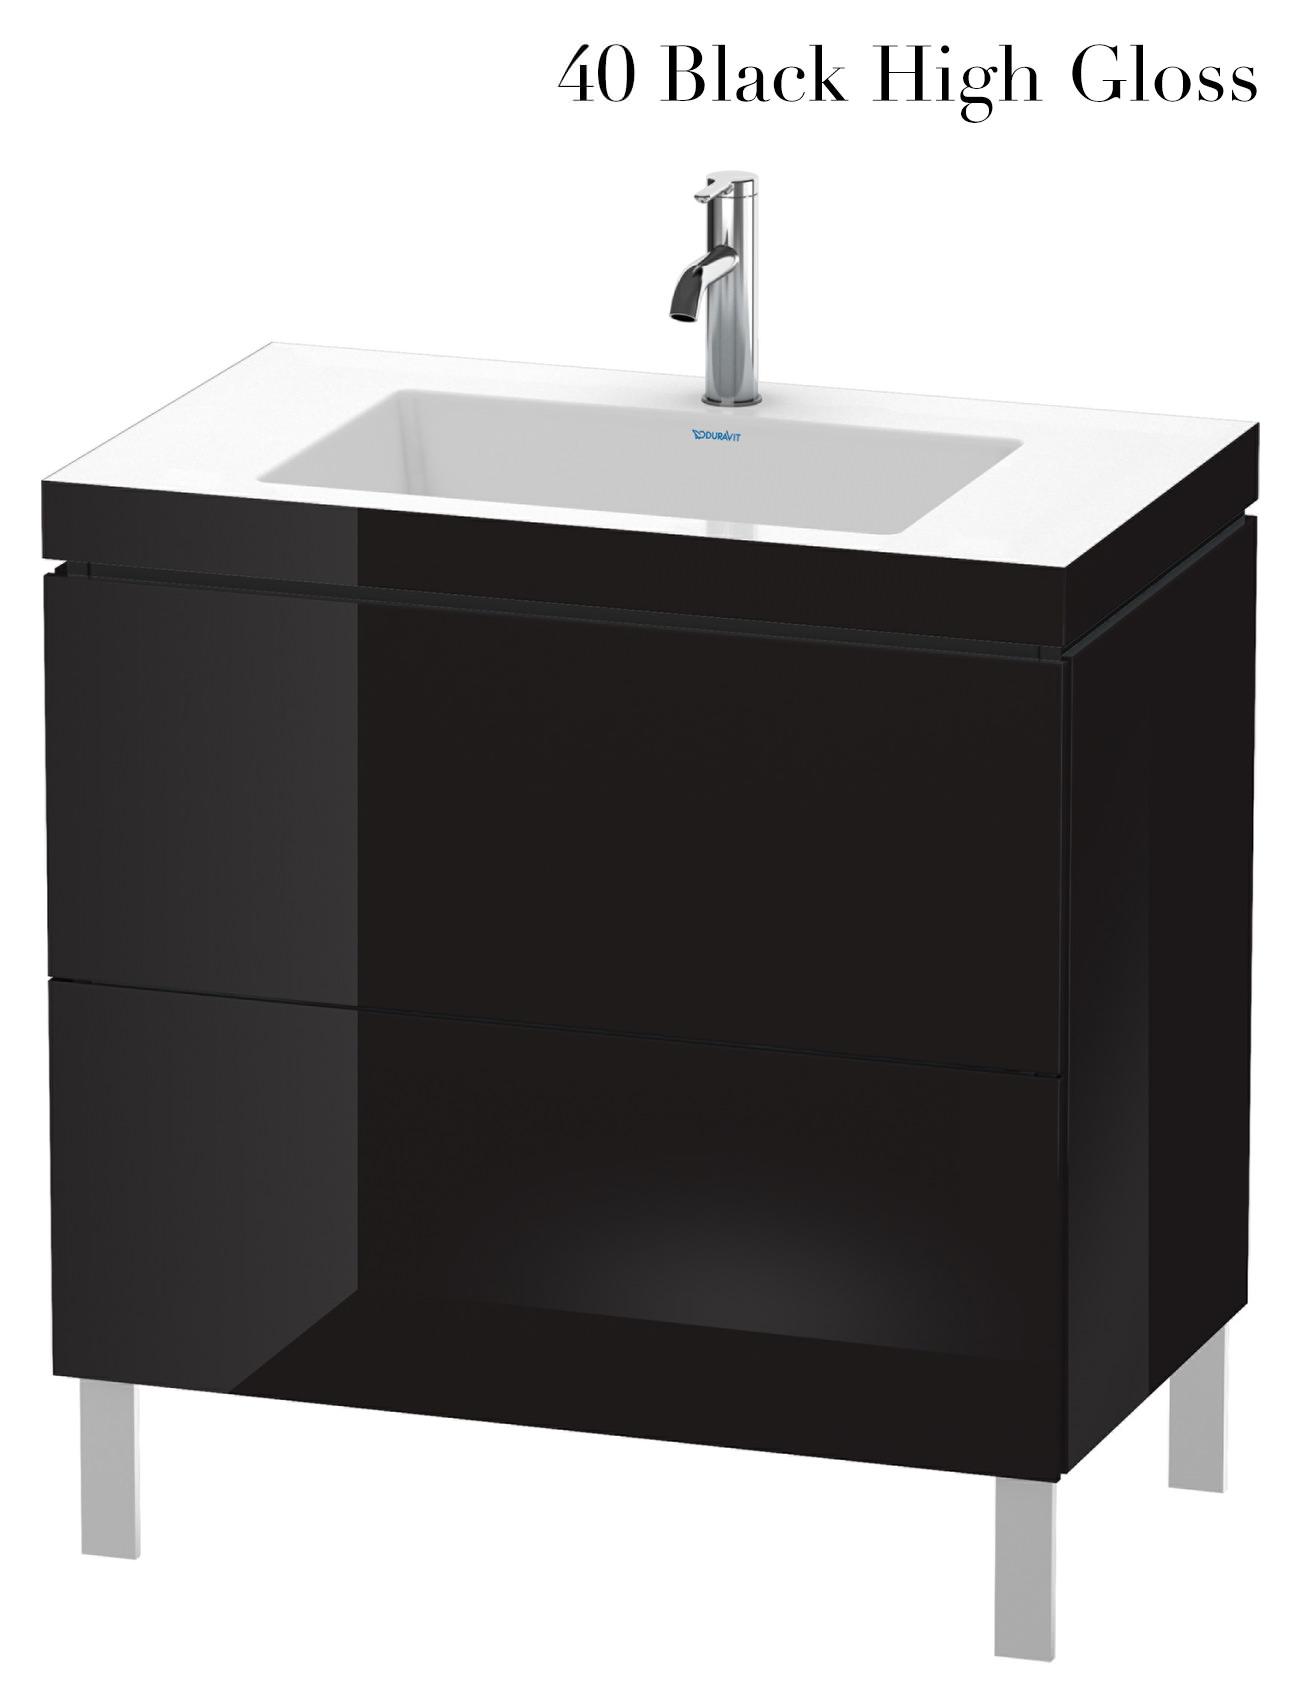 duravit l cube 800mm floor standing vanity unit with c bonded basin. Black Bedroom Furniture Sets. Home Design Ideas